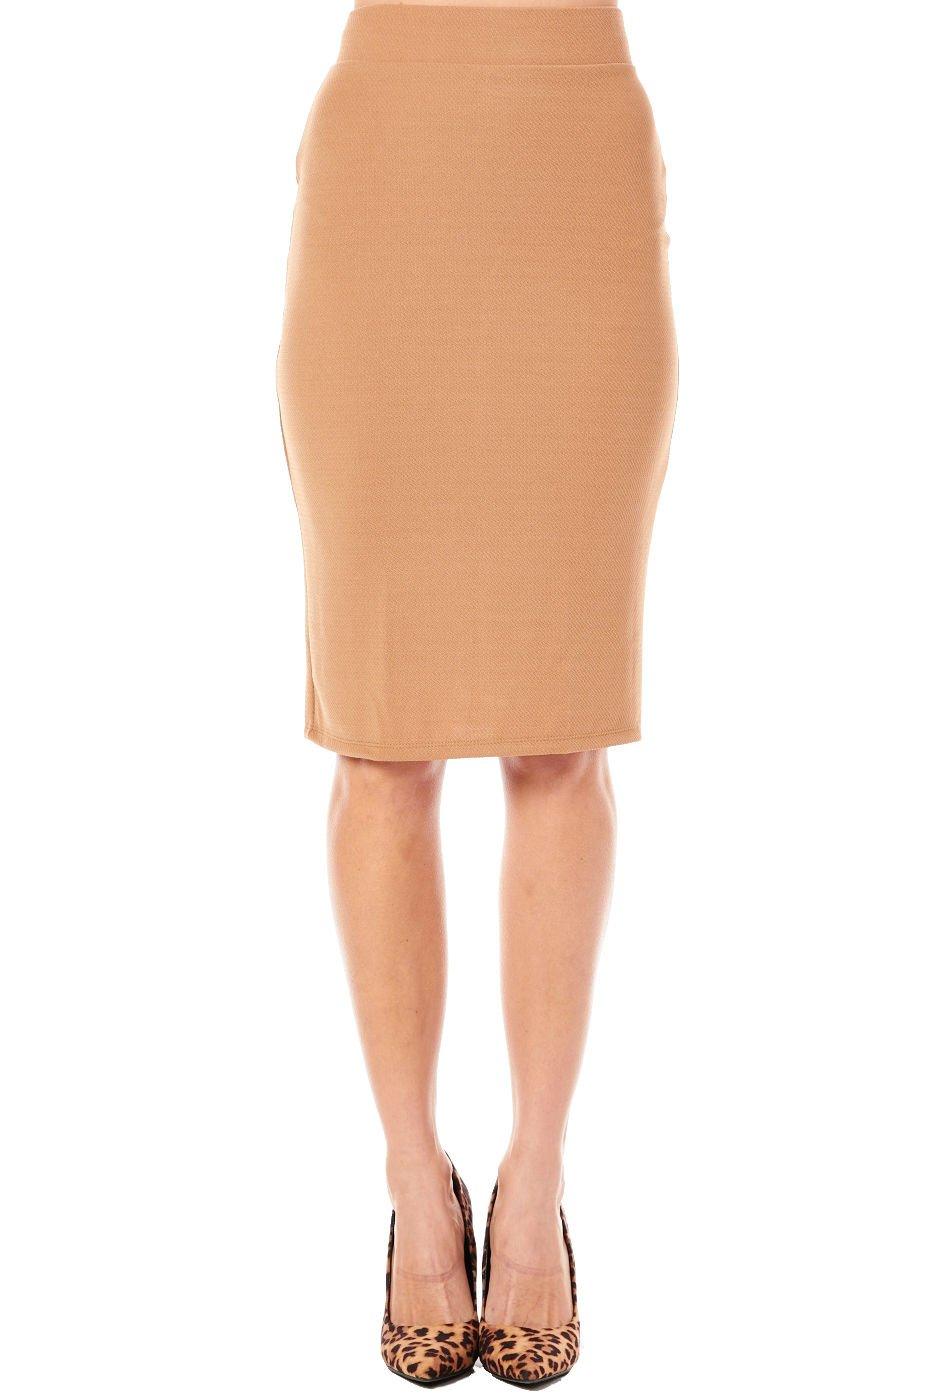 Womens High-Waist Straight Style Lady Pencil Skirt 1160K (L, Mocha)